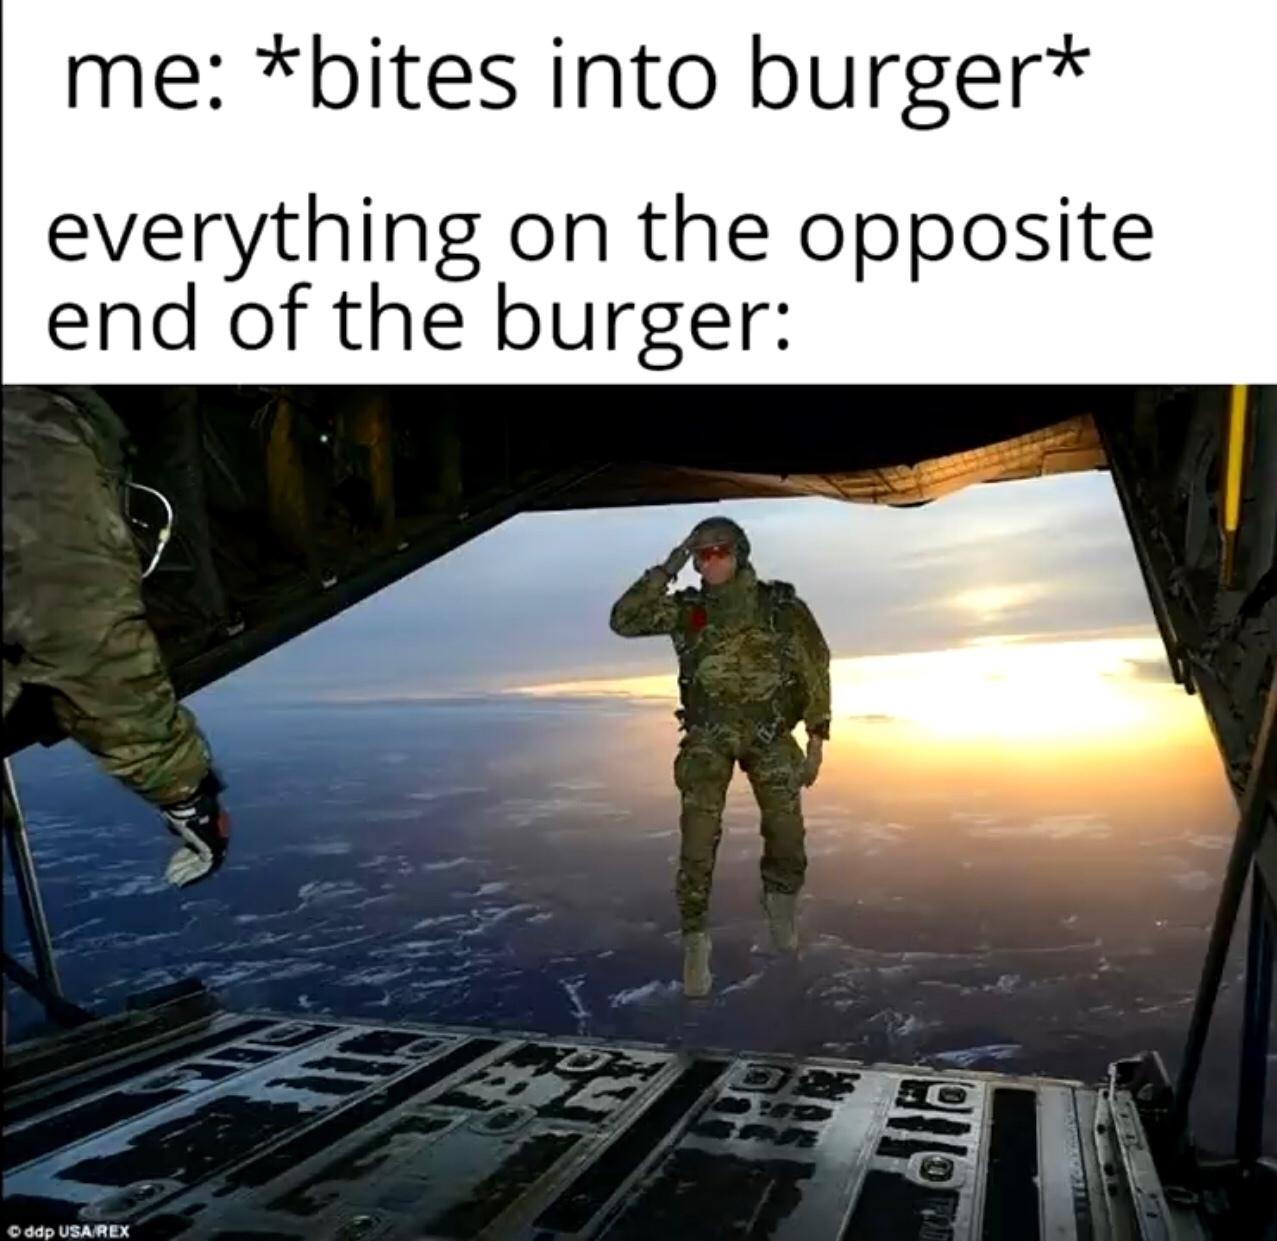 burgers just seem to hate humans - meme